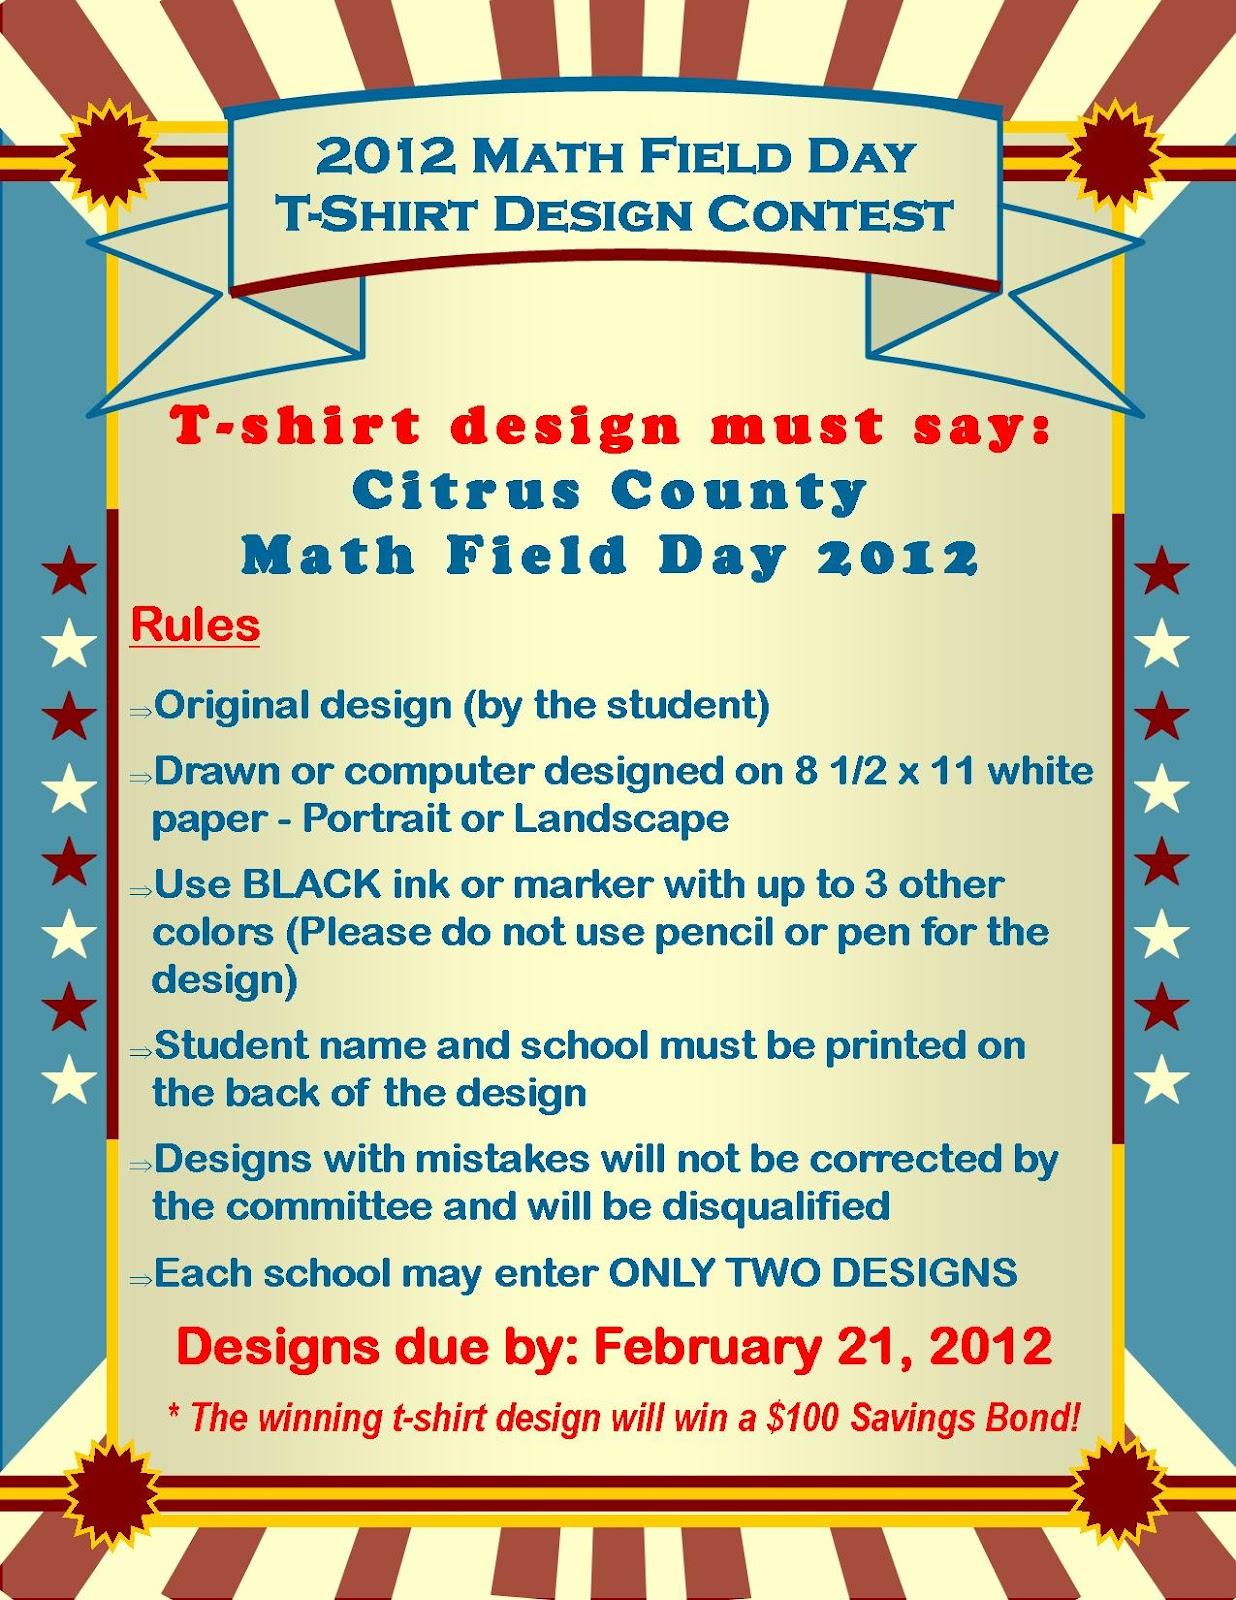 ims team guidance t shirt design contest. Black Bedroom Furniture Sets. Home Design Ideas